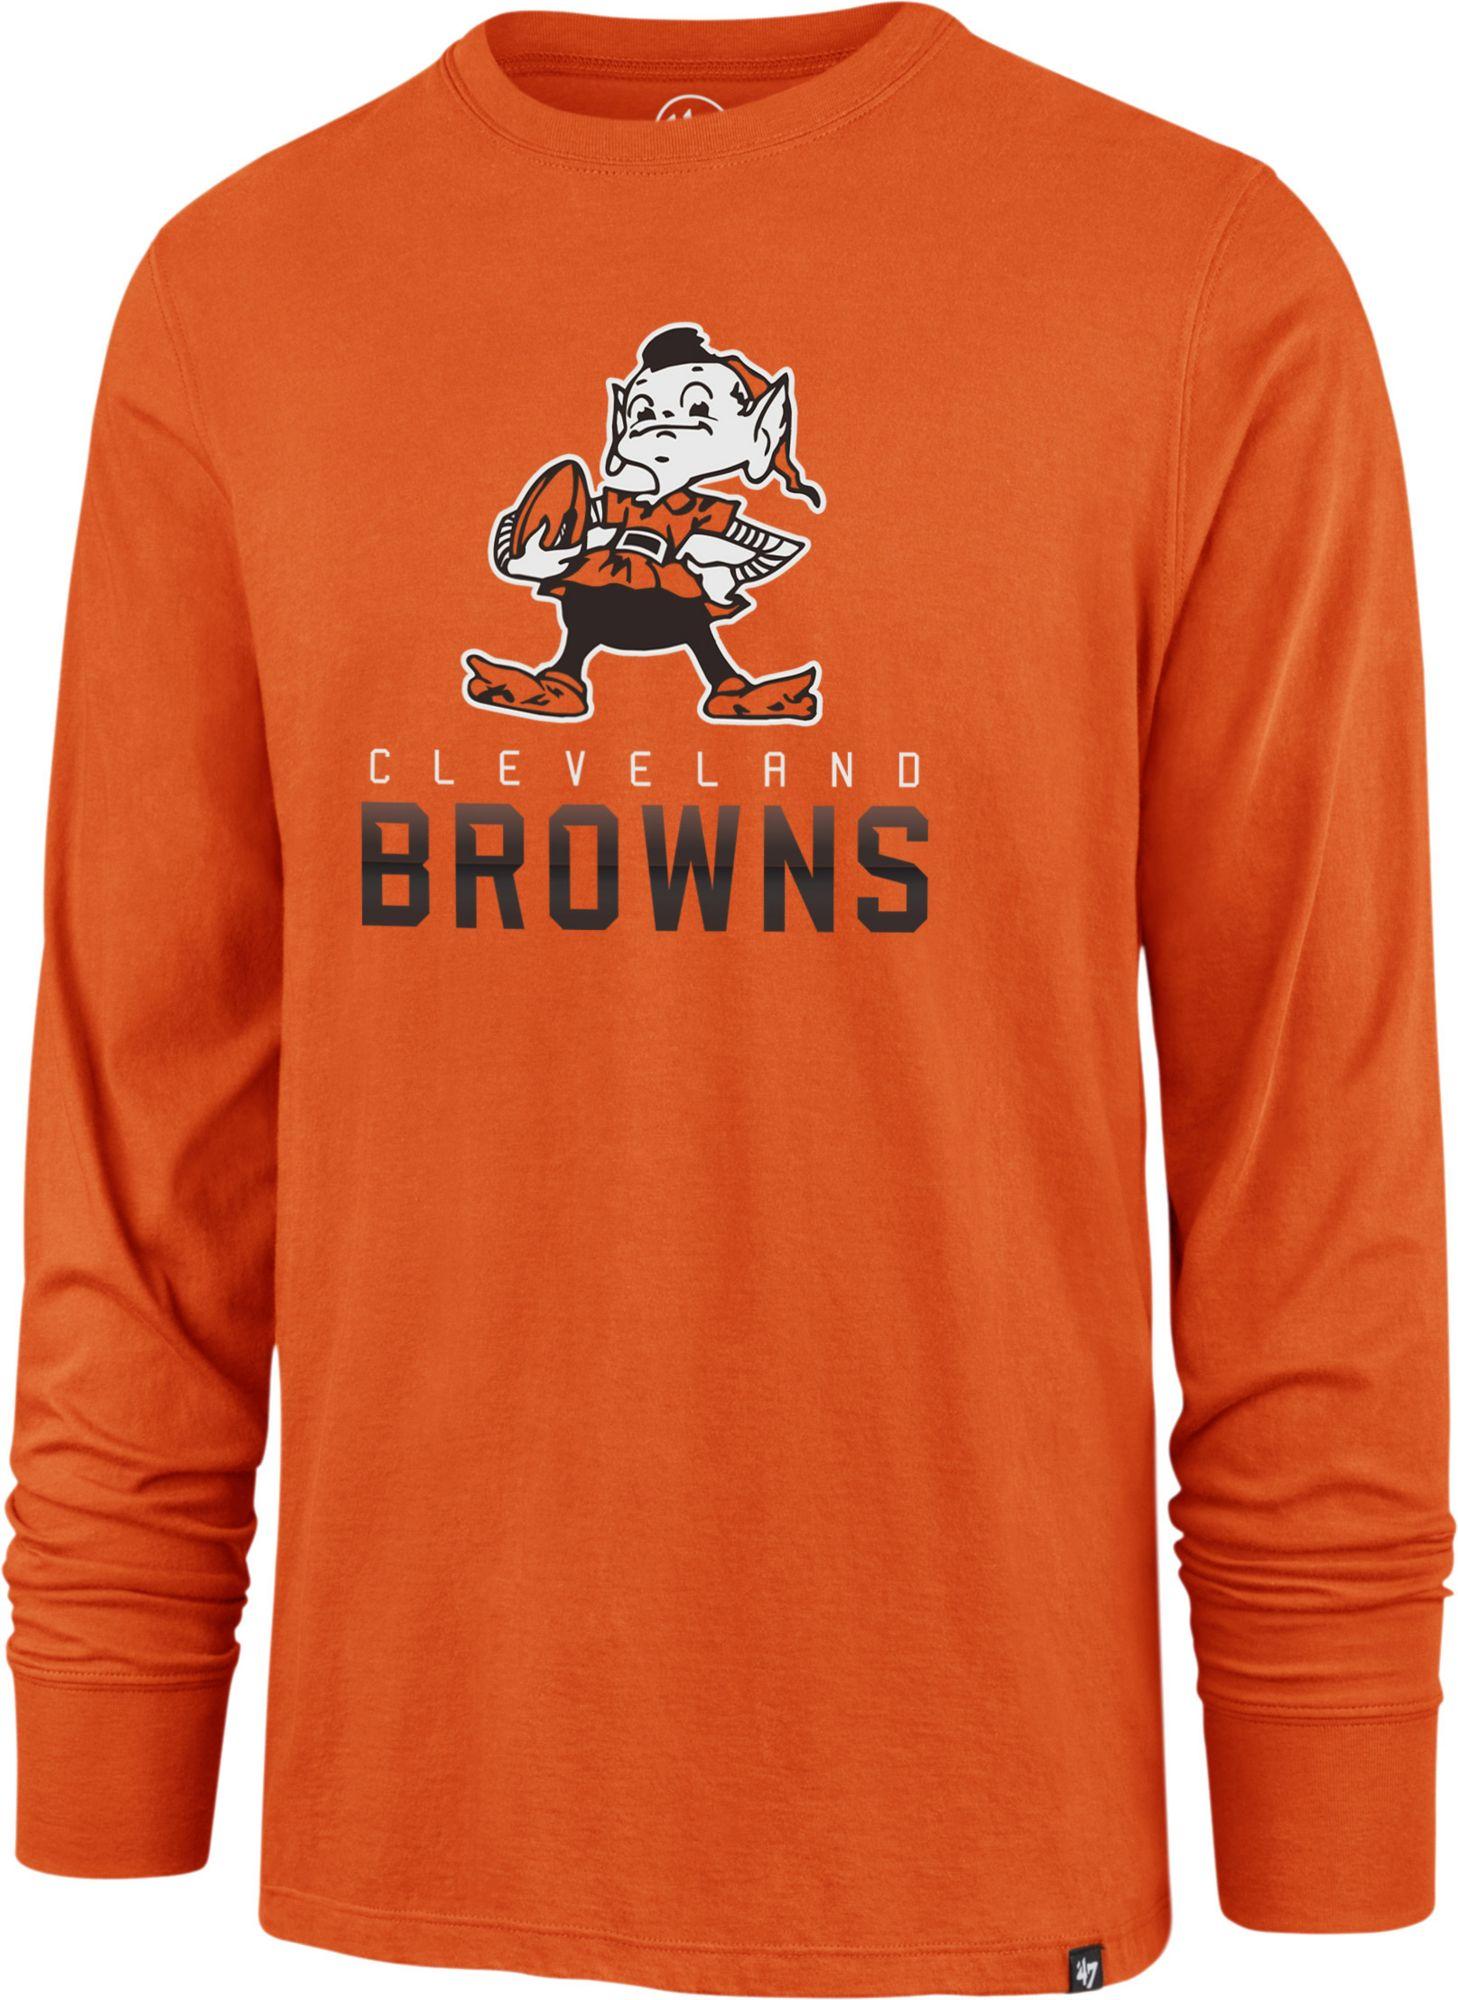 868f77f1 '47 Men's Cleveland Browns Rival Orange Long Sleeve Shirt